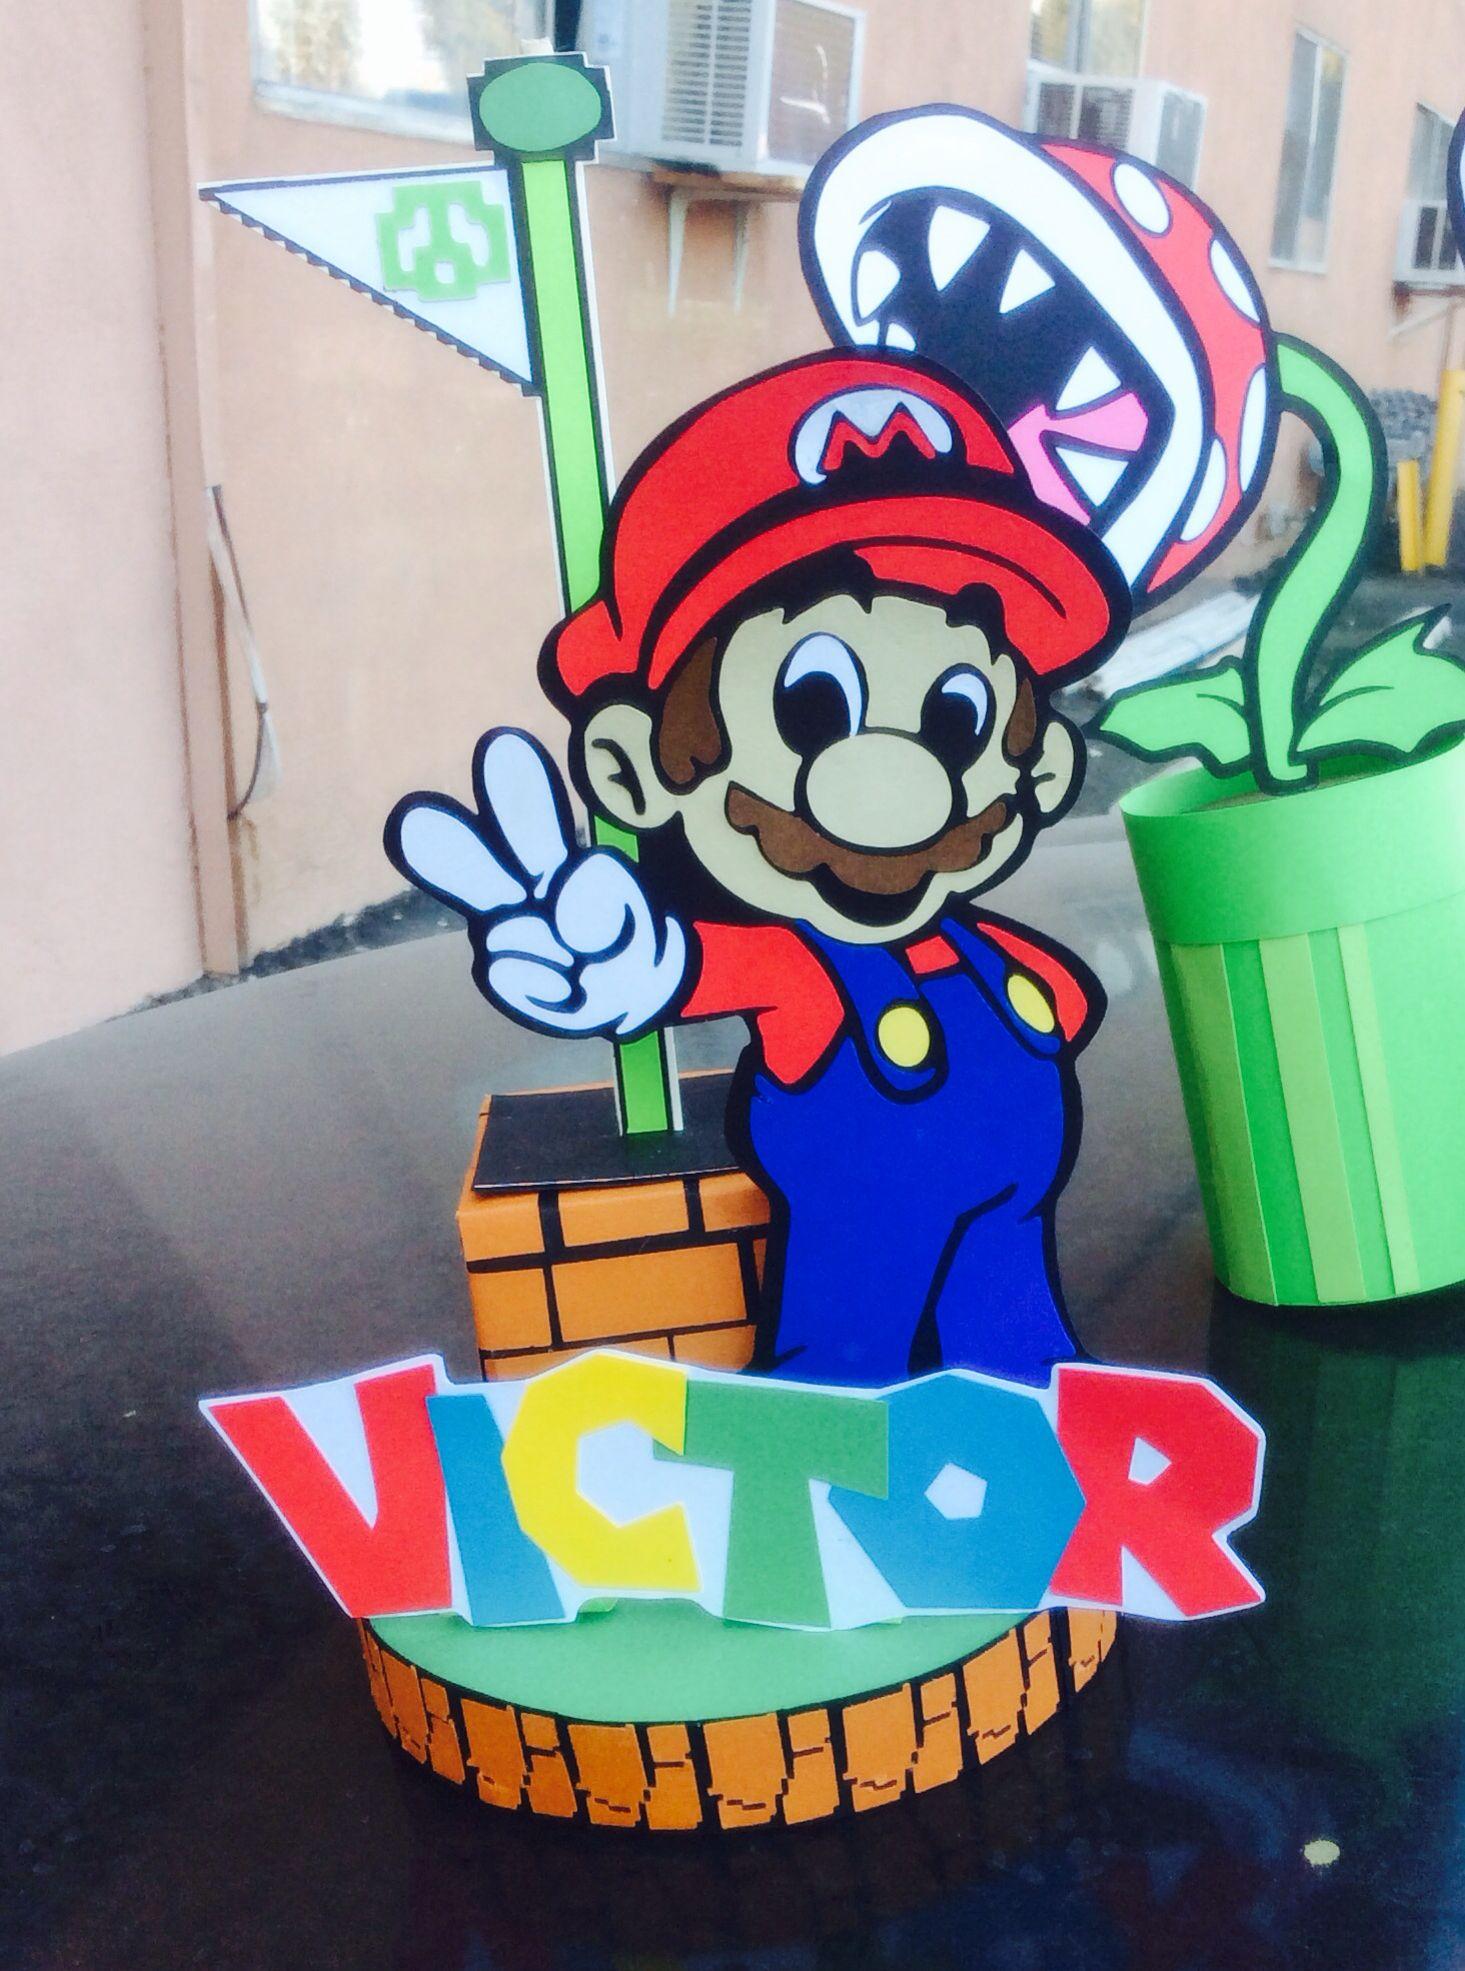 Mario Bros Birthday Centerpiece>Mario Level Complete>DIY>Cricut